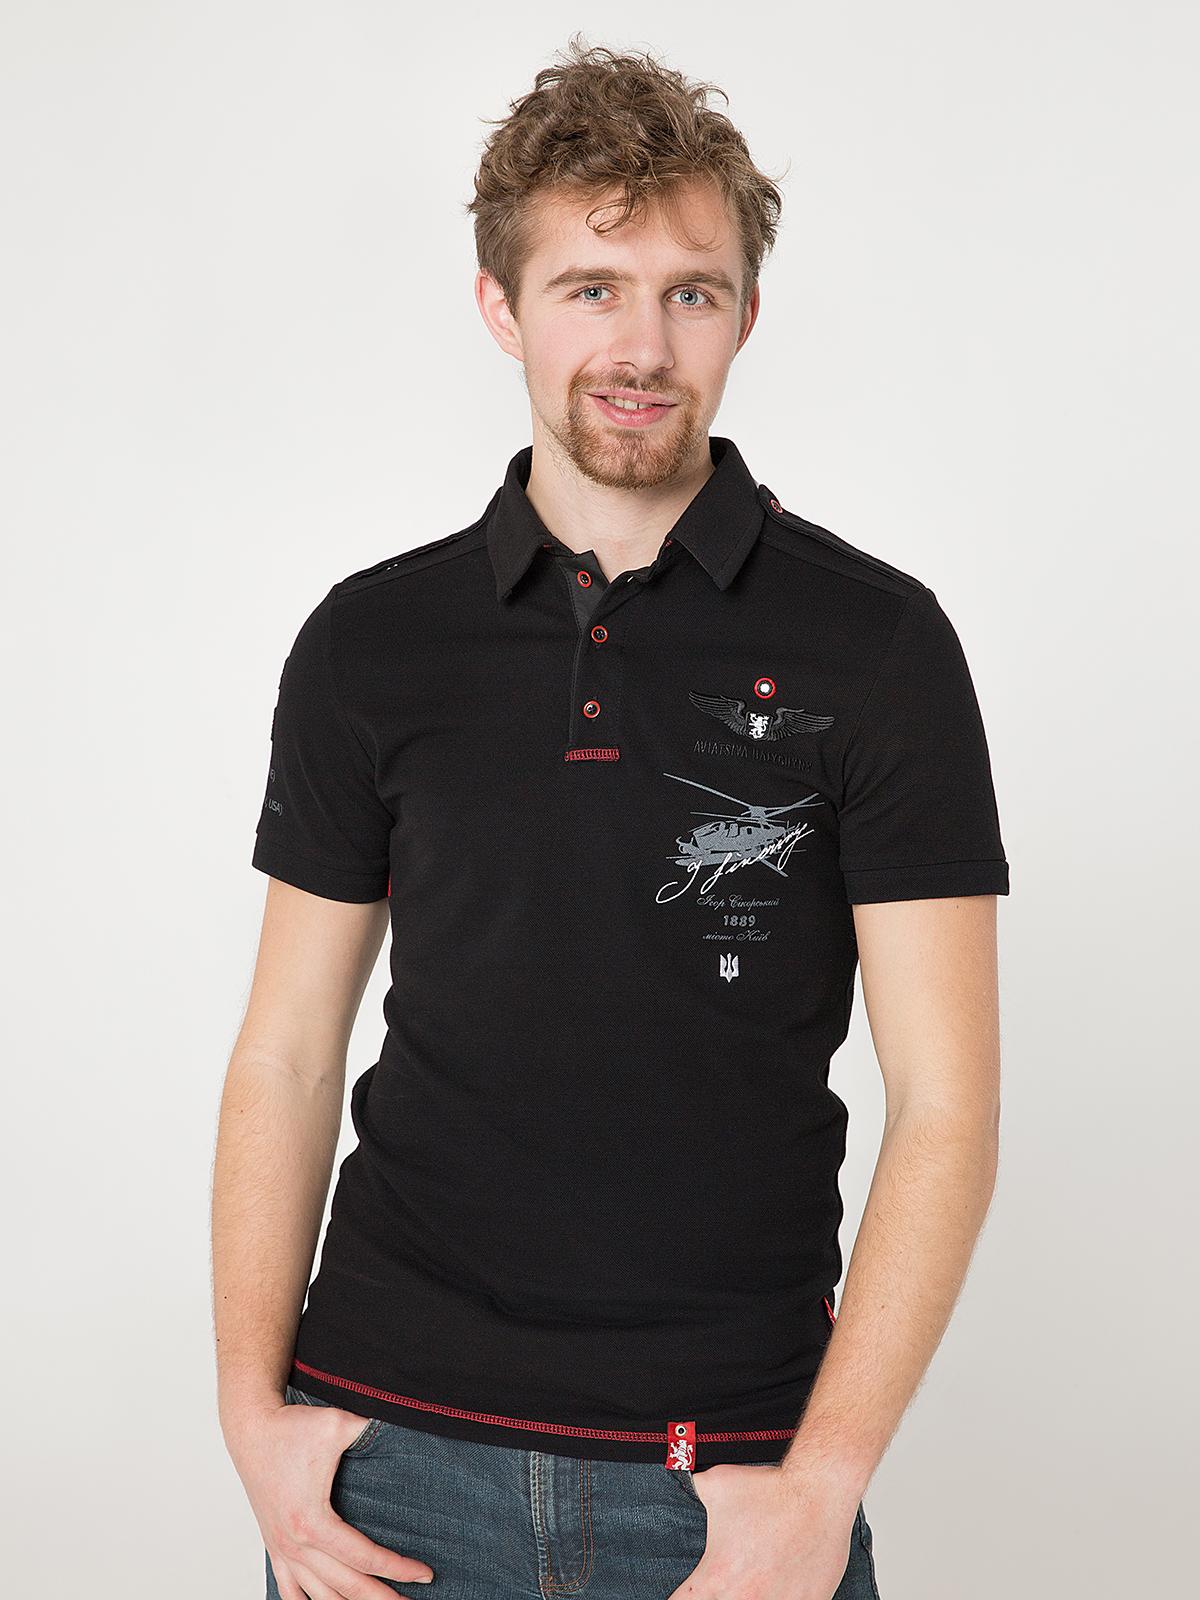 Men's Polo Shirt Sikorsky. Color black. Pique fabric: 100% cotton.